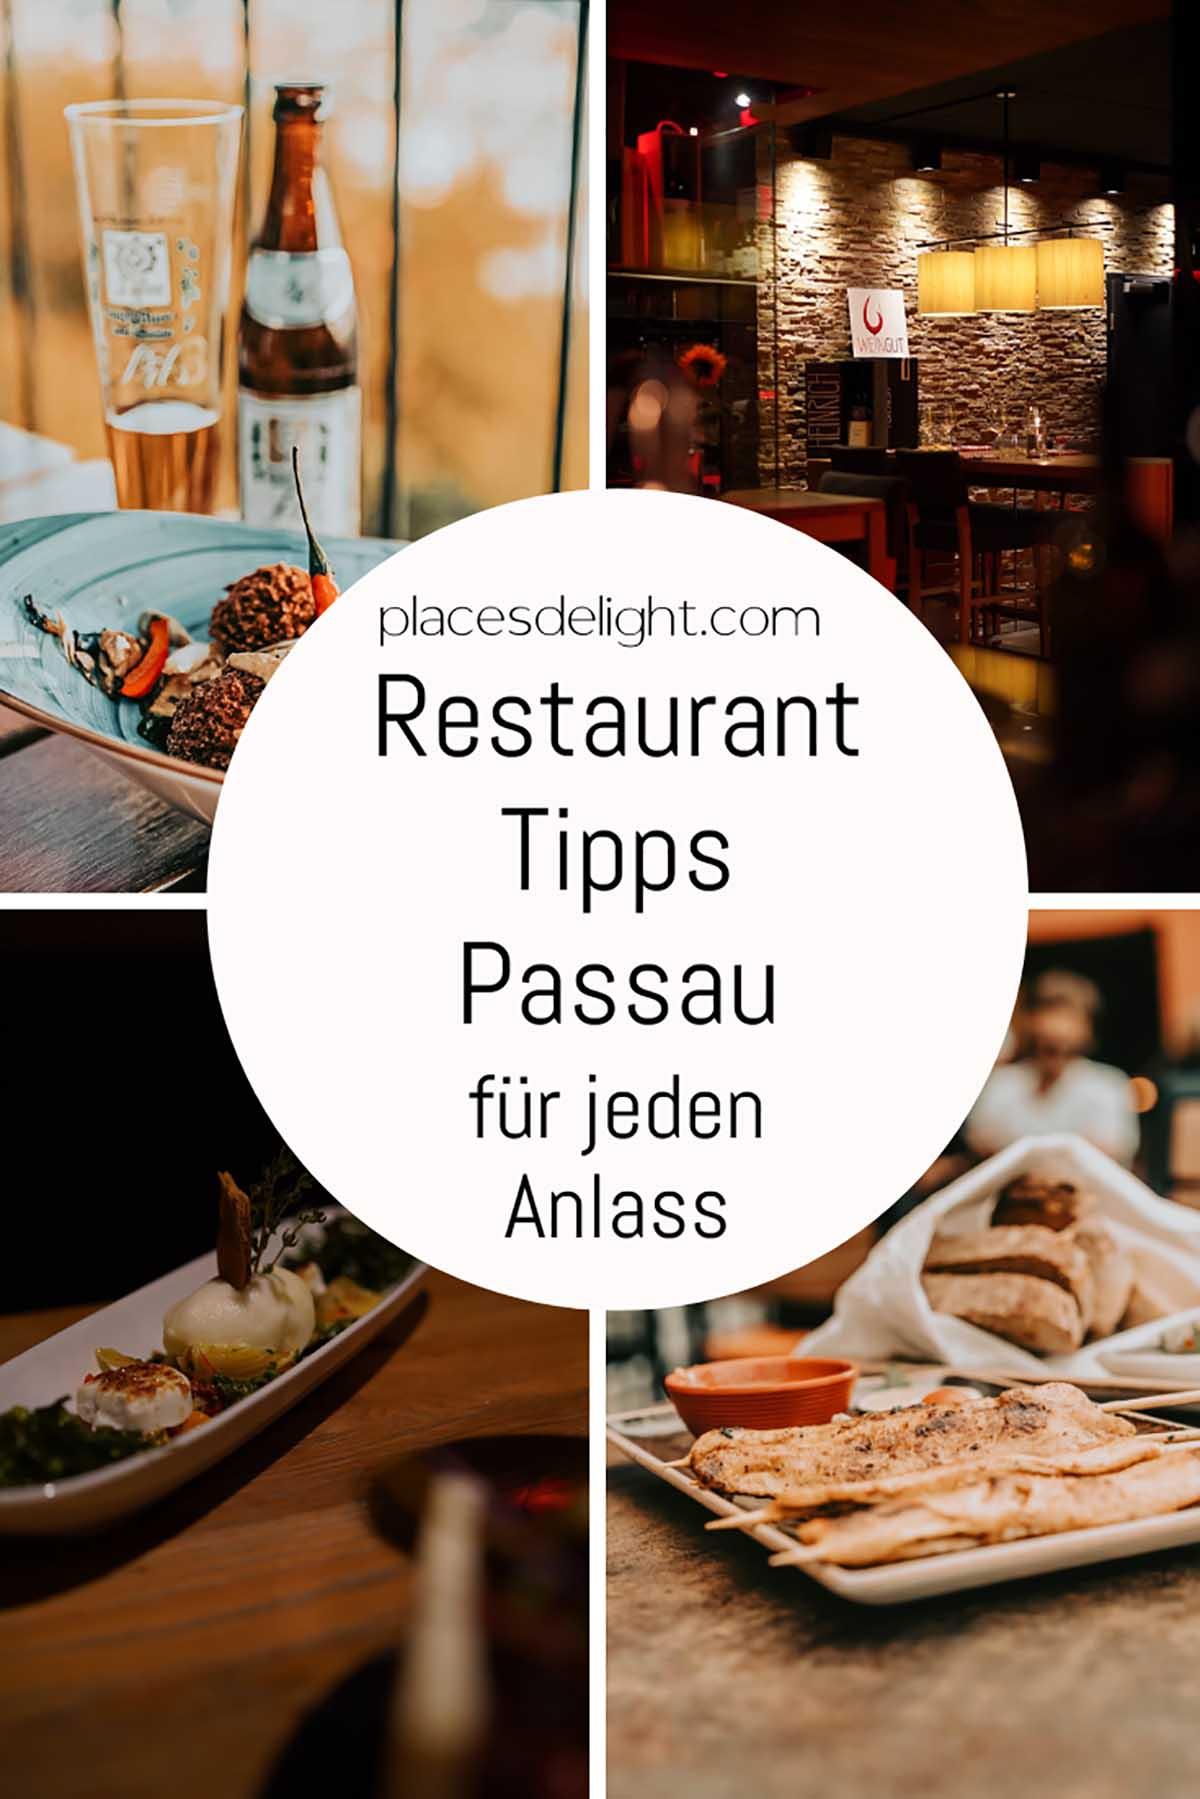 placesdelight-restaurant-tipps-passau